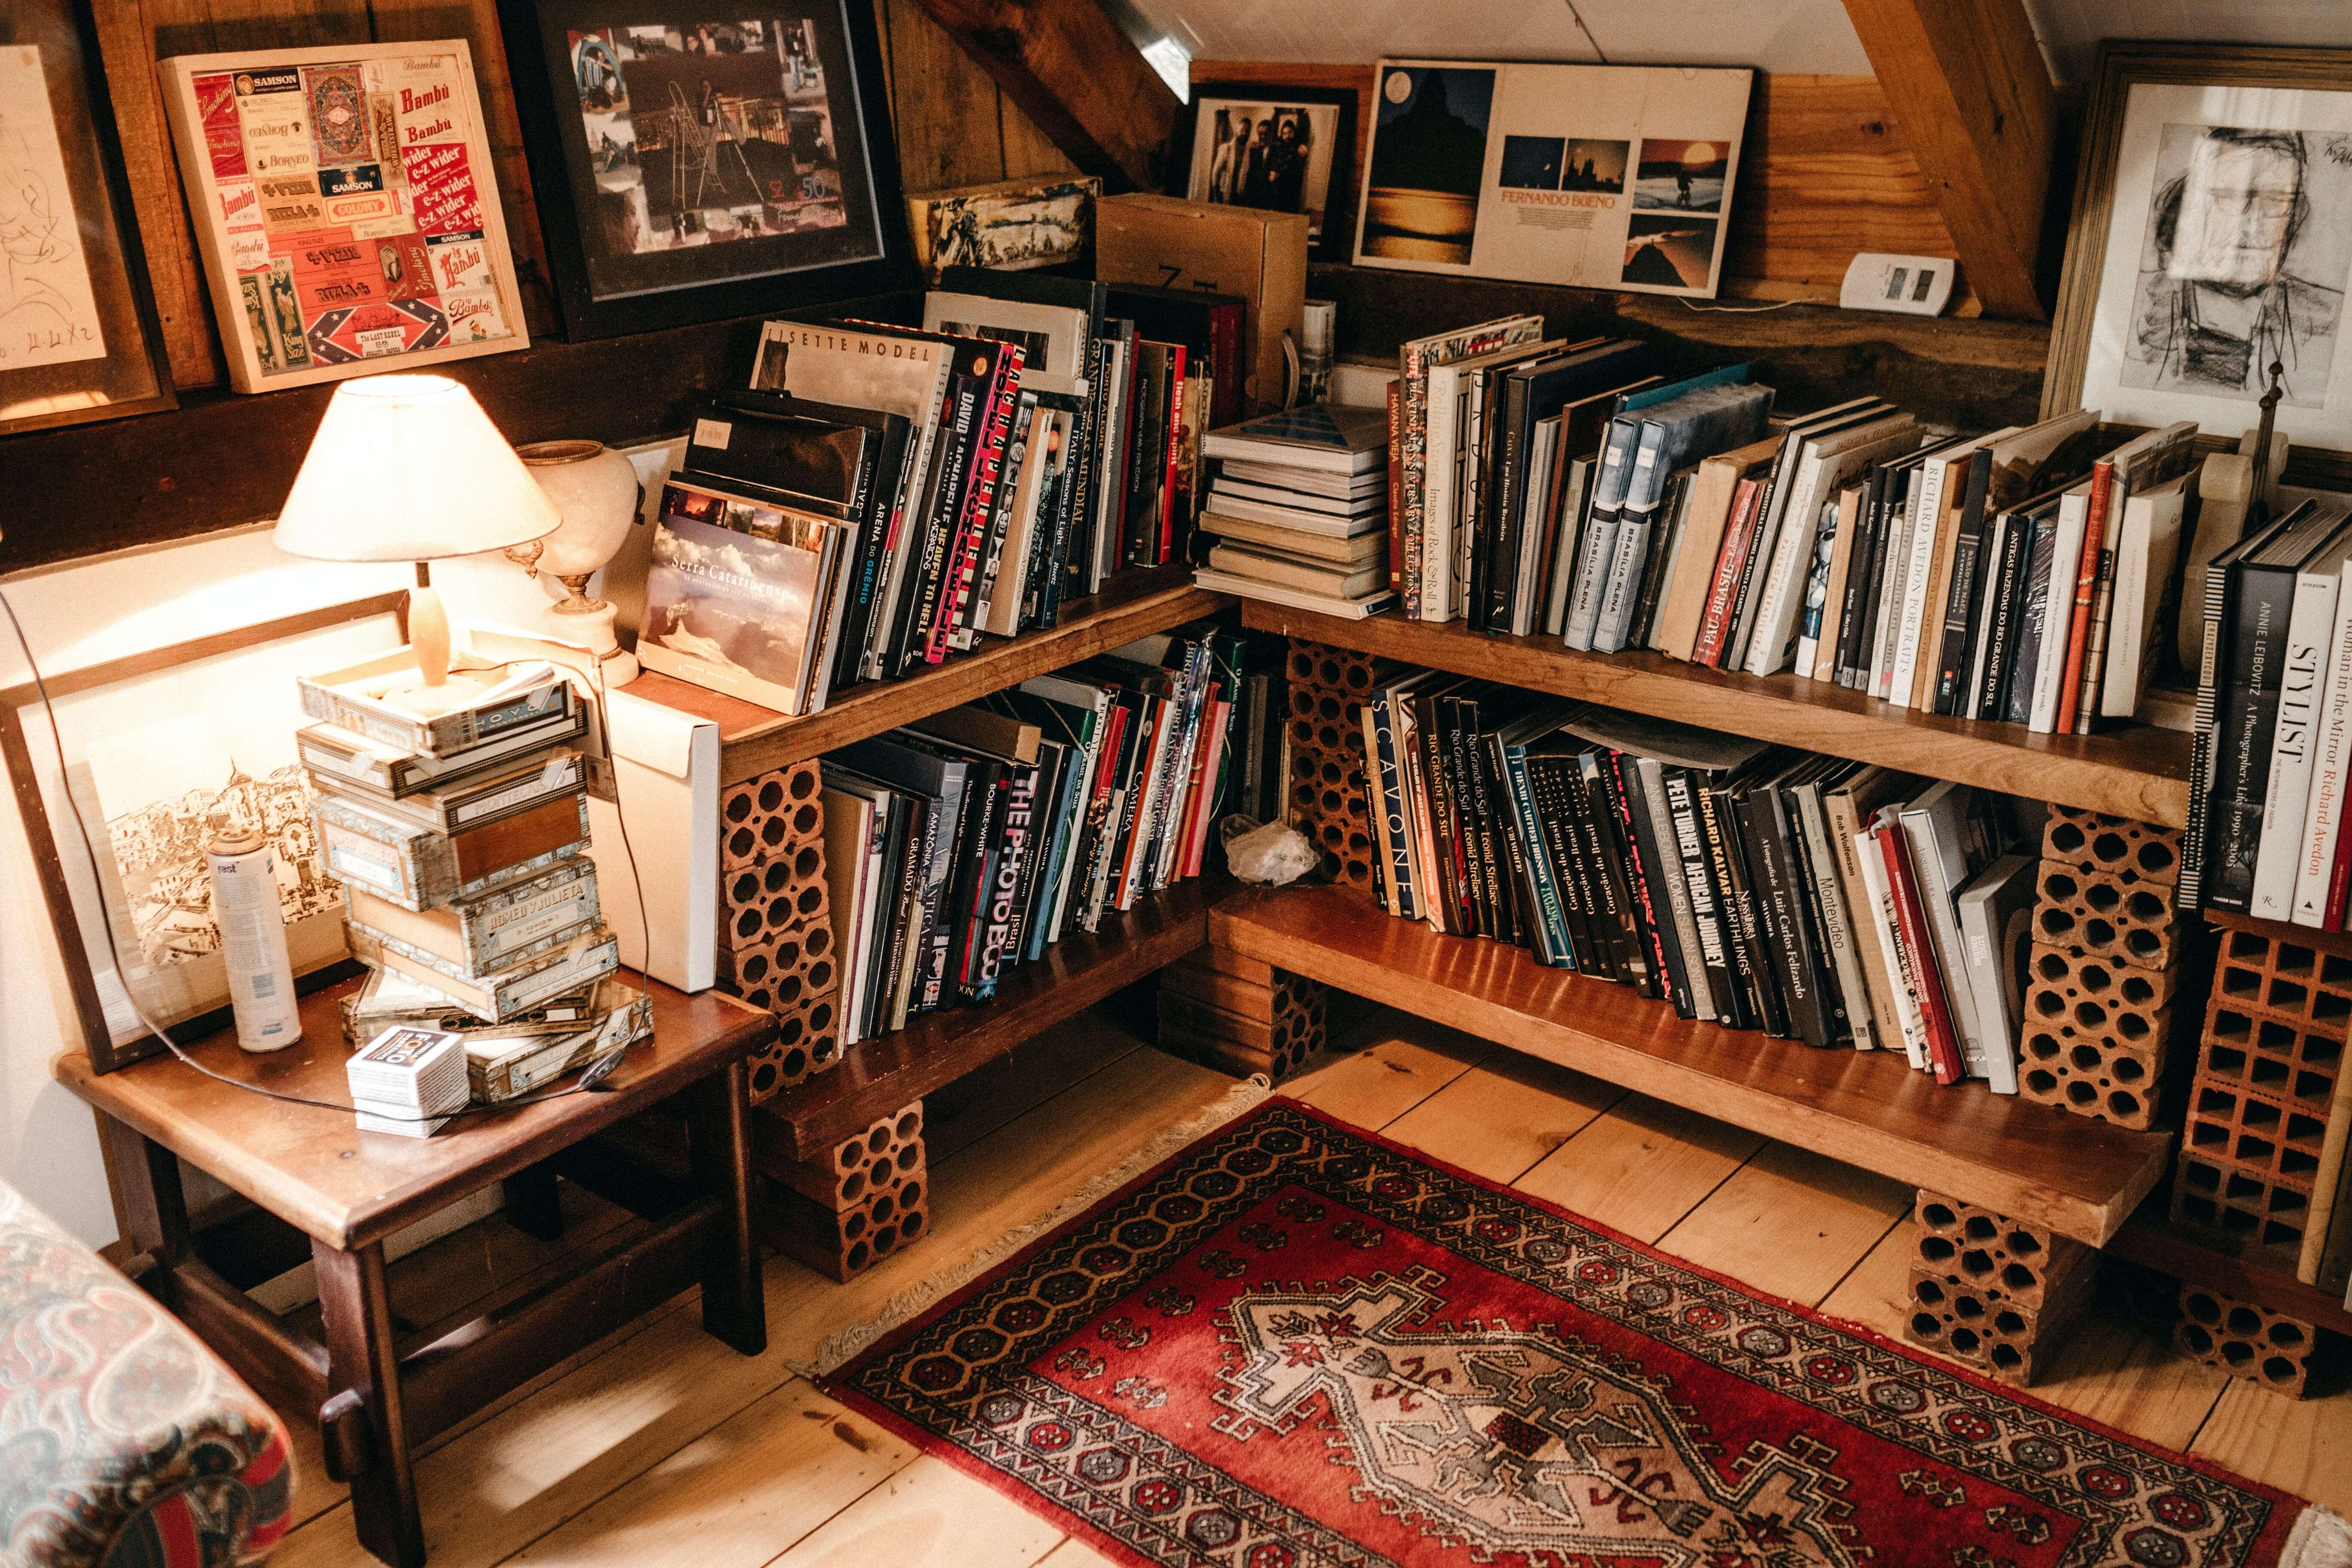 books-on-brown-wooden-shelf